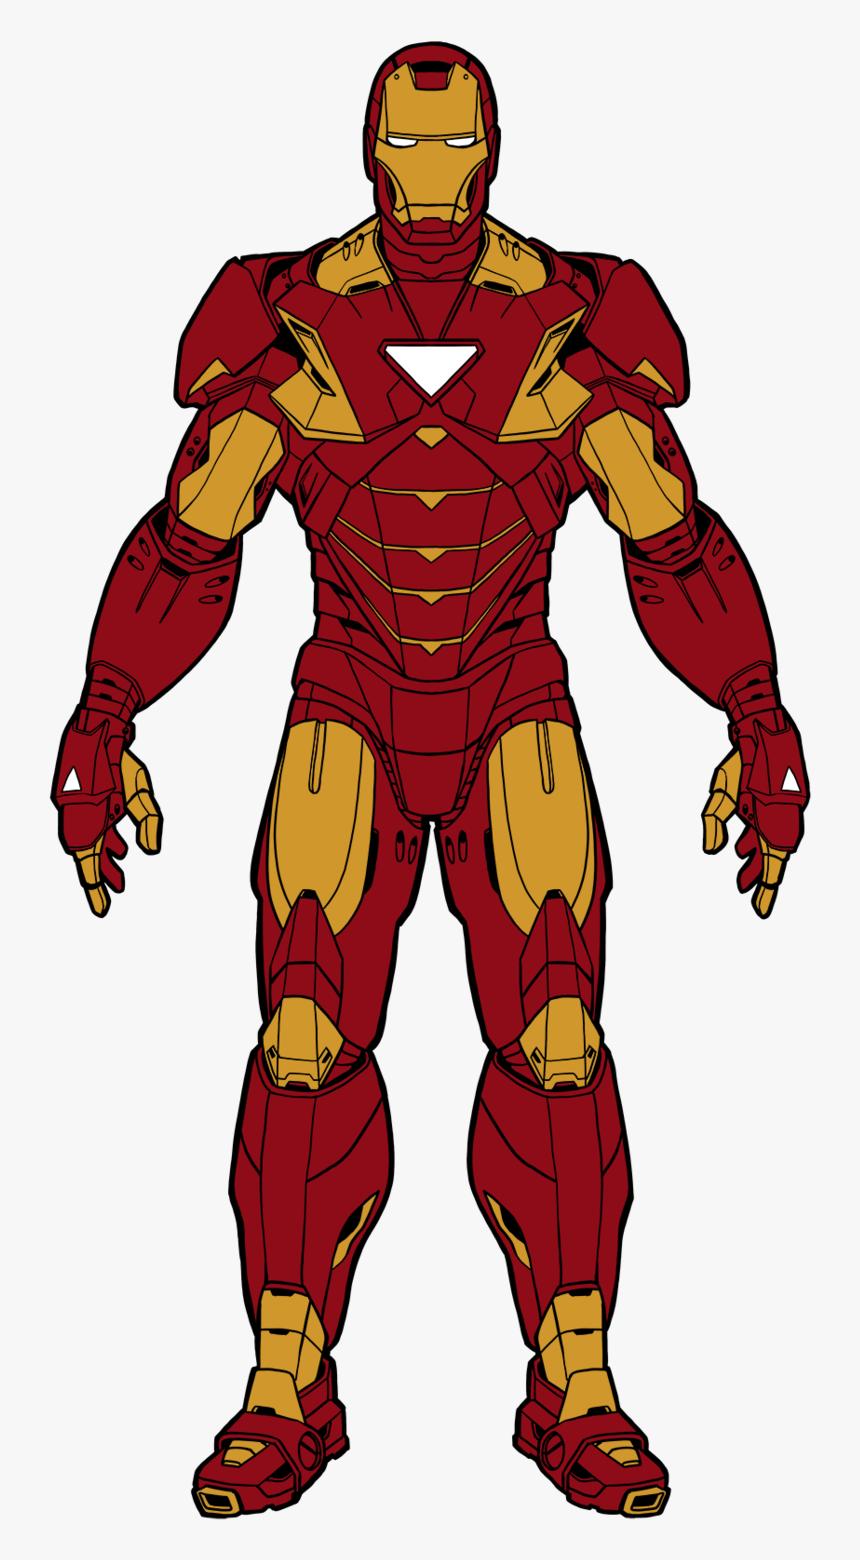 Iron Man Cartoon Drawing Color - Iron Man Body Drawing, HD Png Download, Free Download